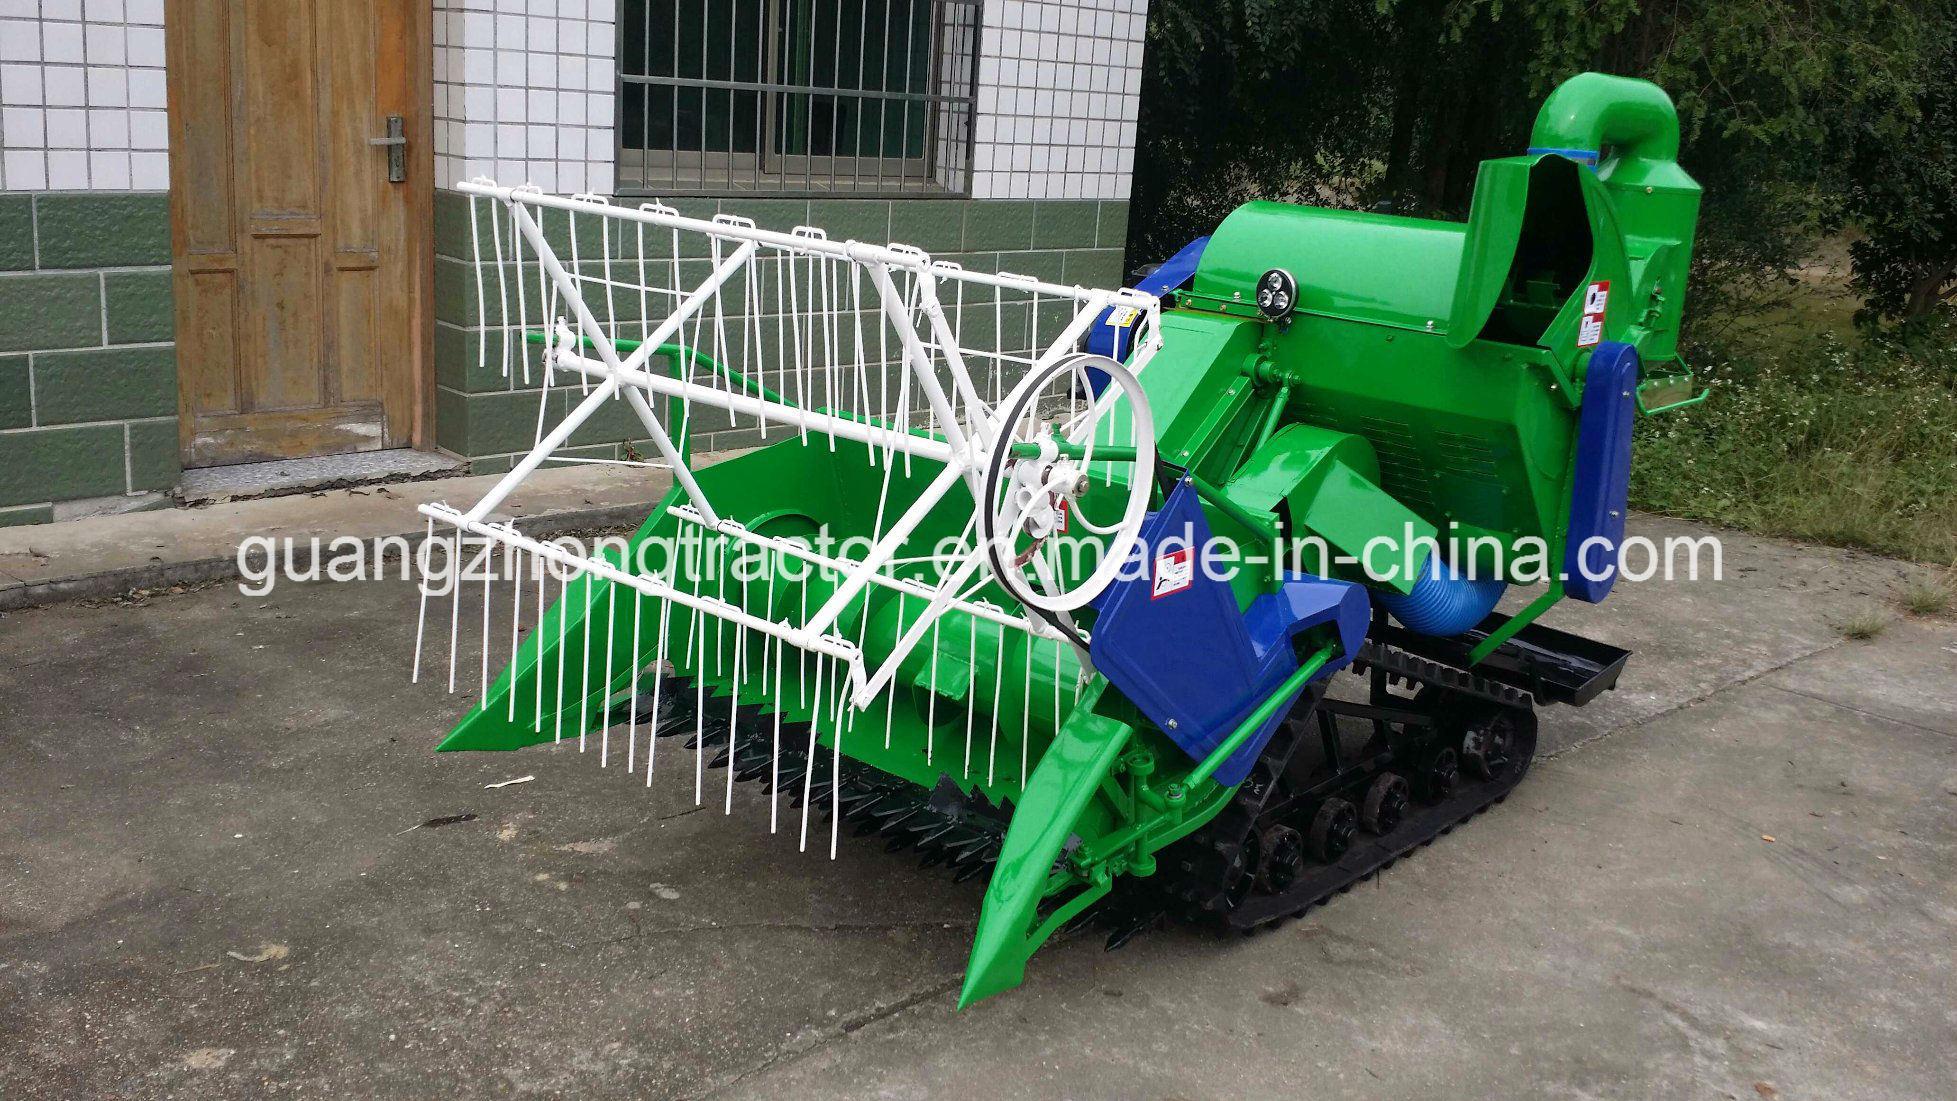 4lz-0.7 Rice and Wheat Combine Harvester Mini Type